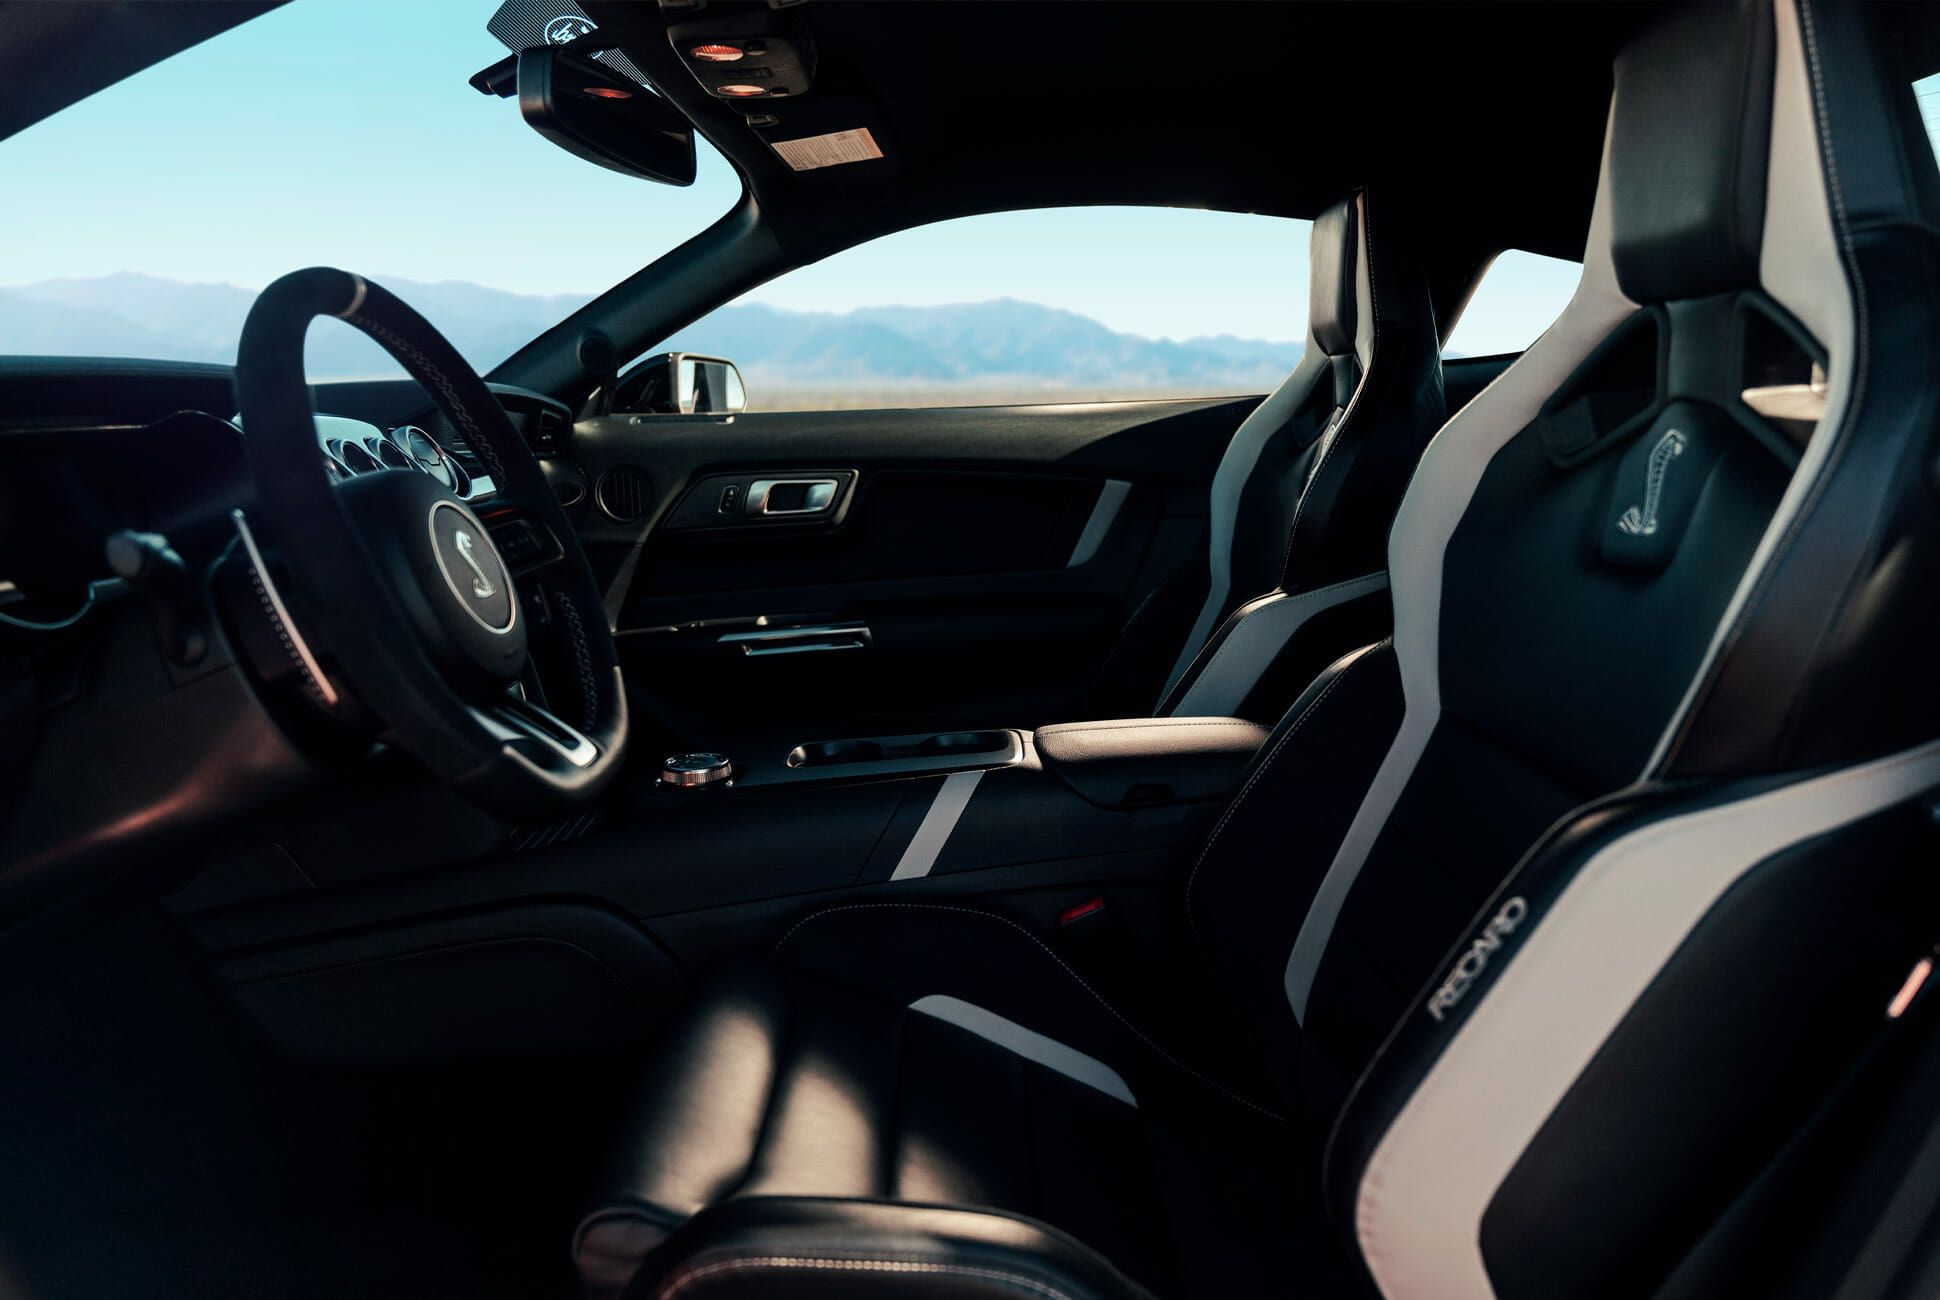 Mustang-GT500-Gear-Patrol-slide-8